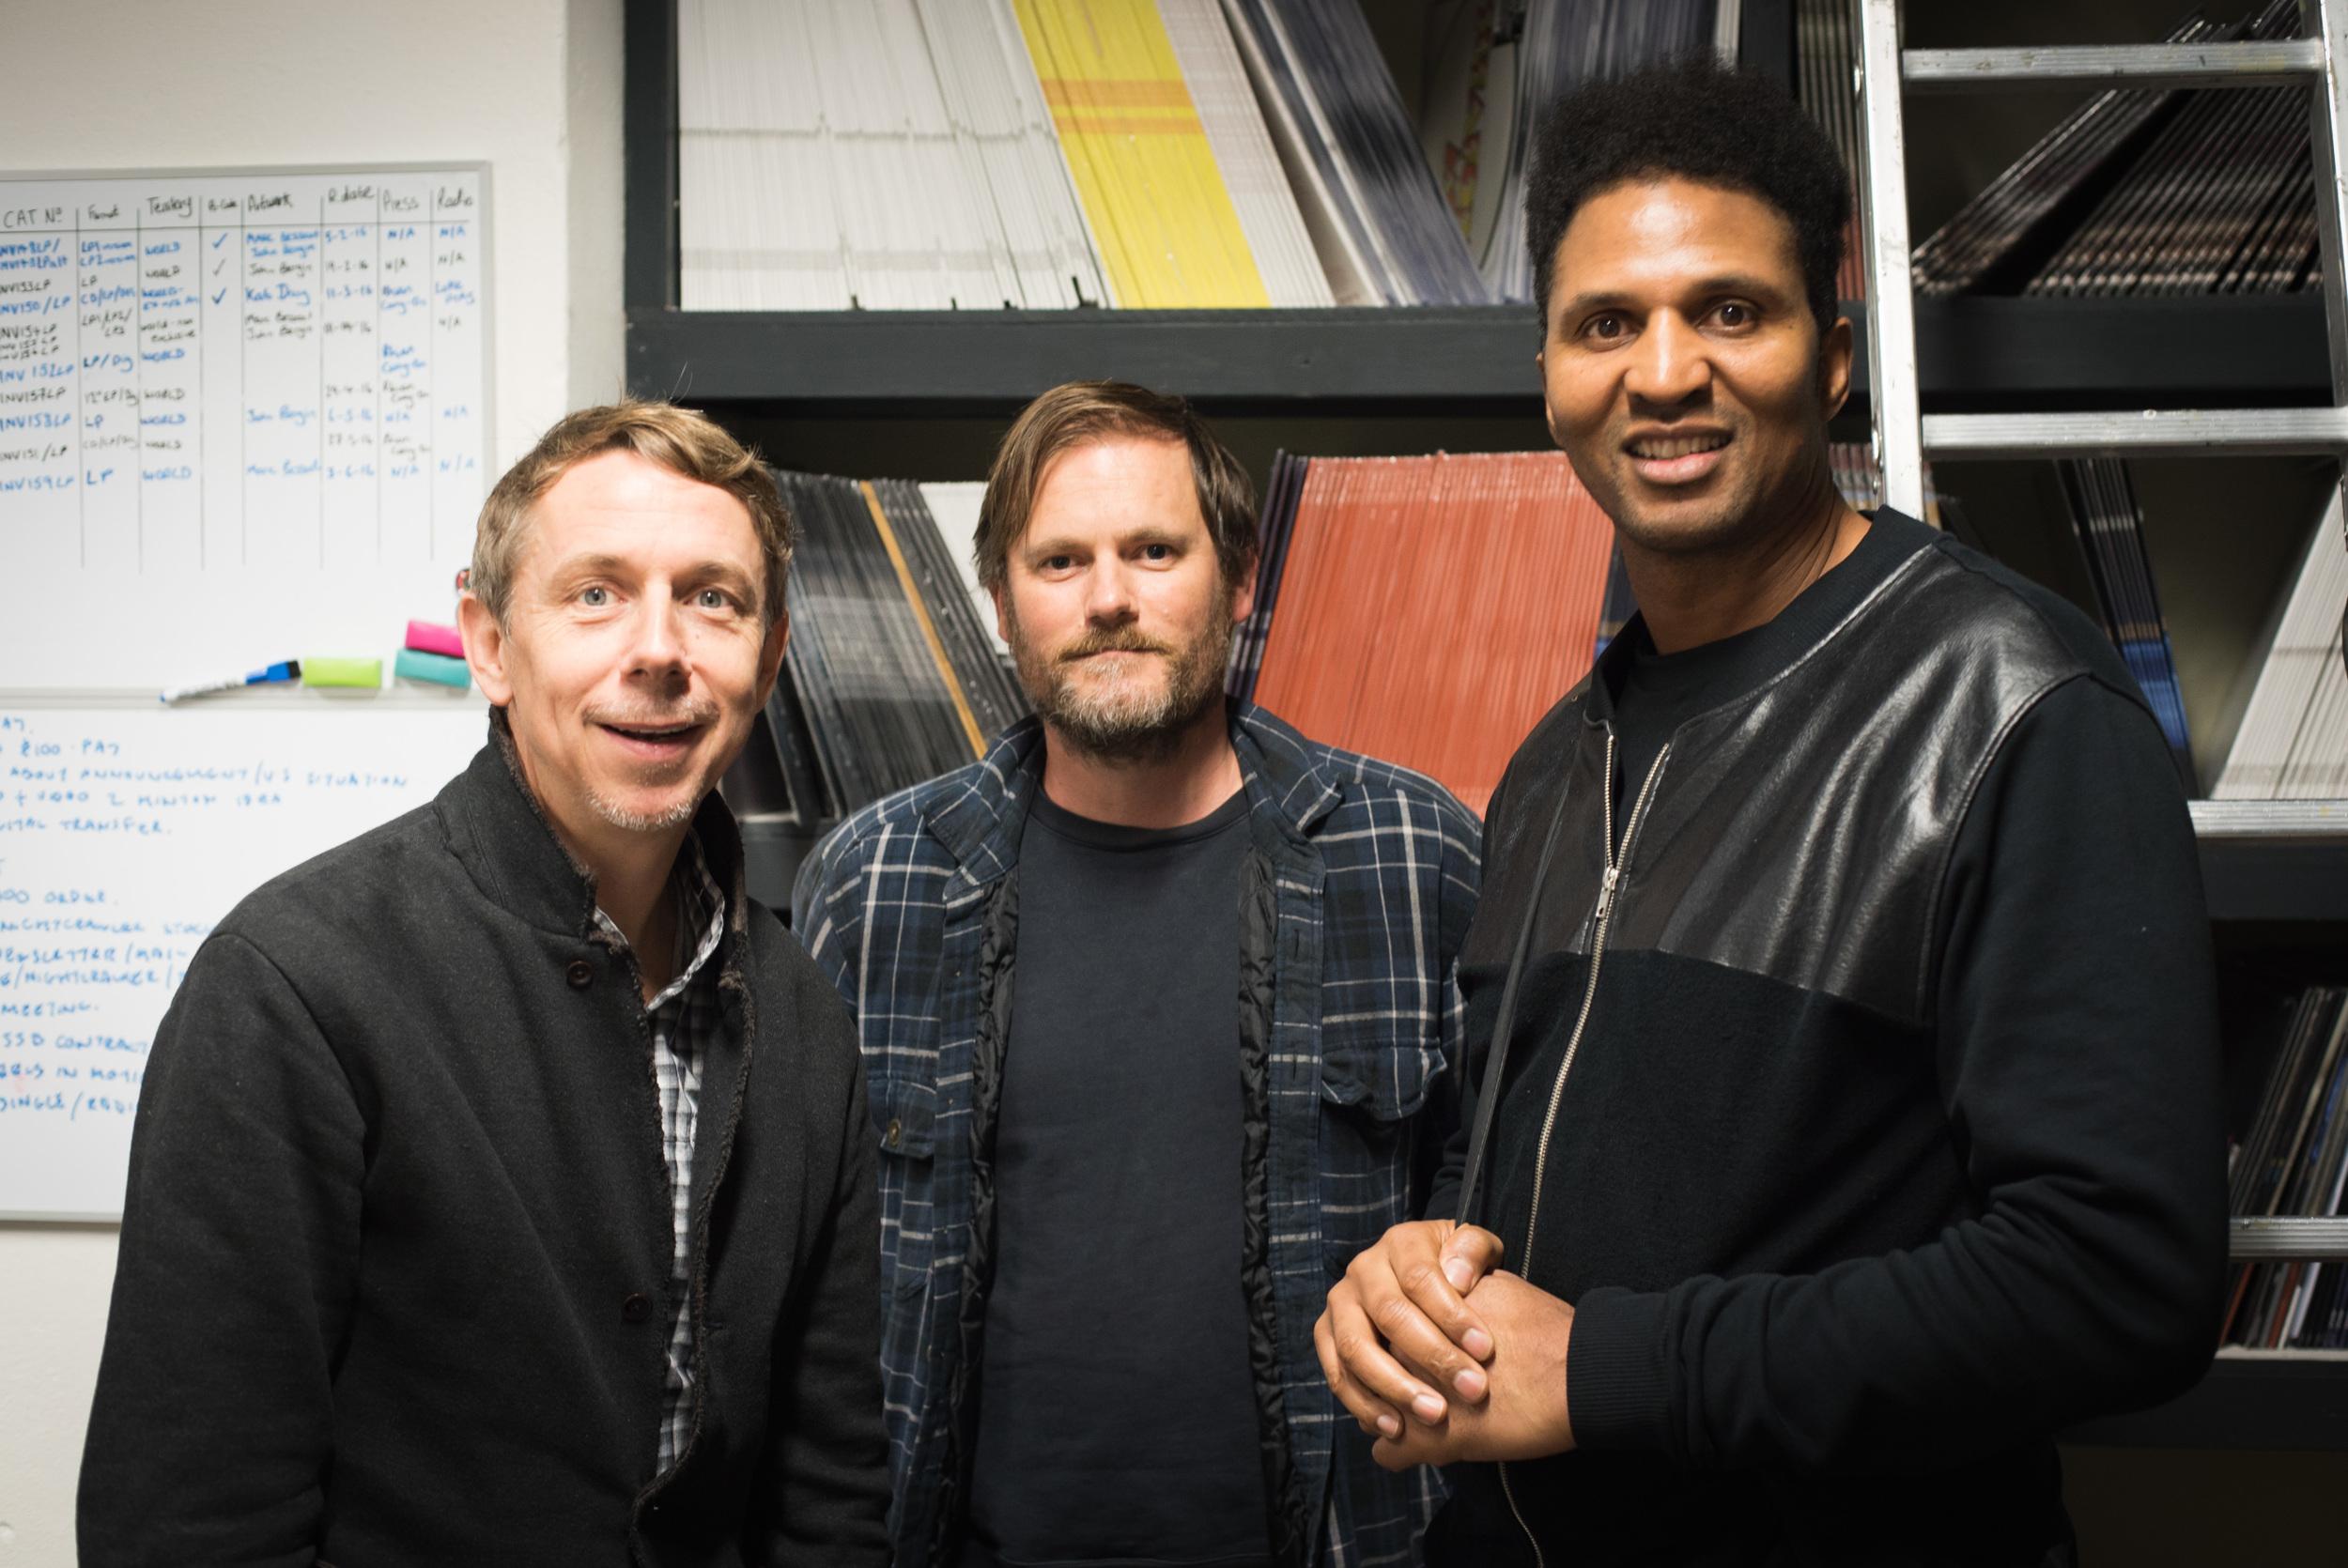 Peterson, Geoff Barrow (of Portishead), and DJ Krust